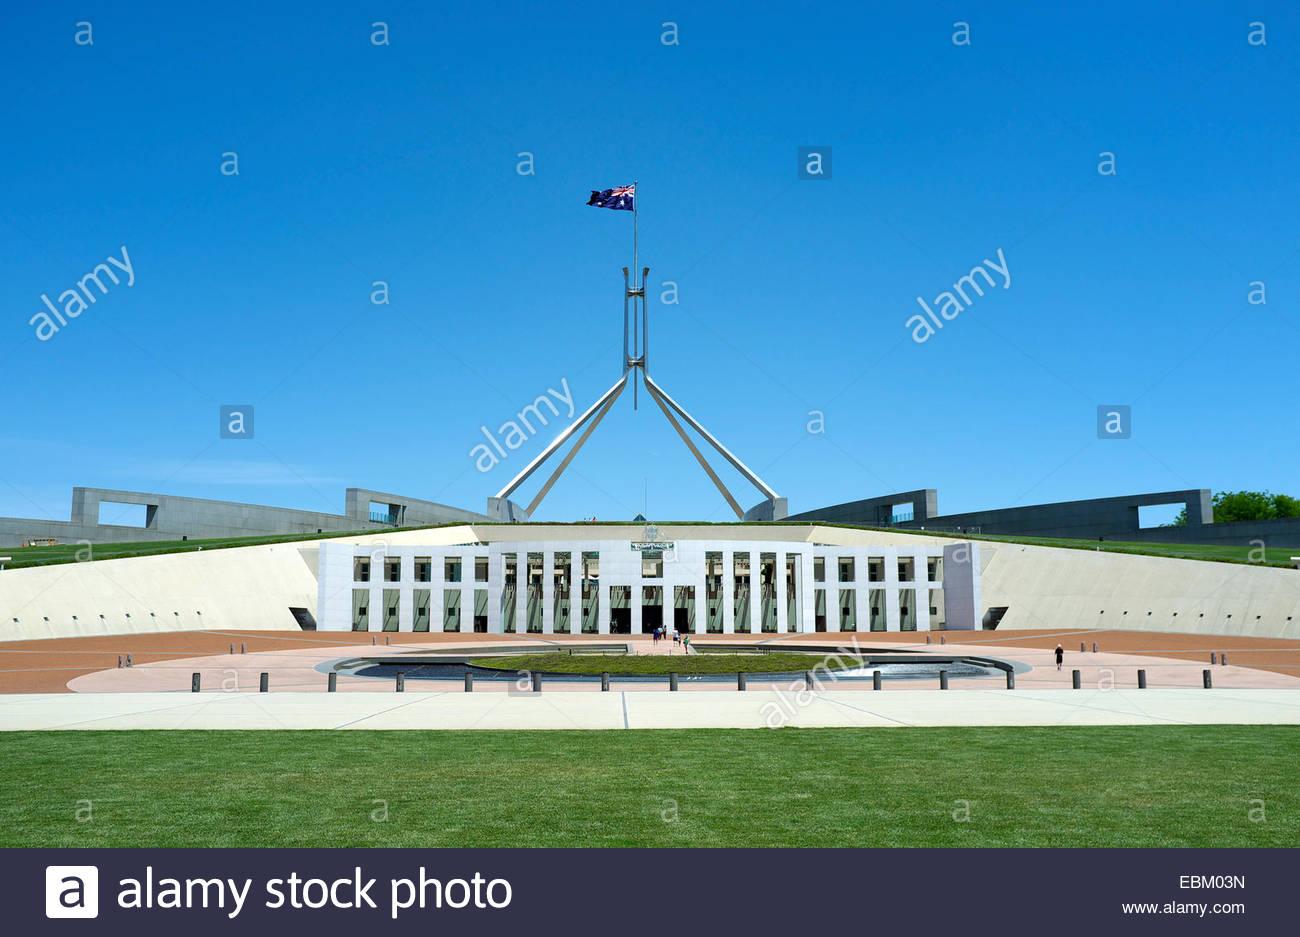 Australian capital city - Parliament House, on Capital Hill. Canberra, Australian Capital Territory, Australia. - Stock Image